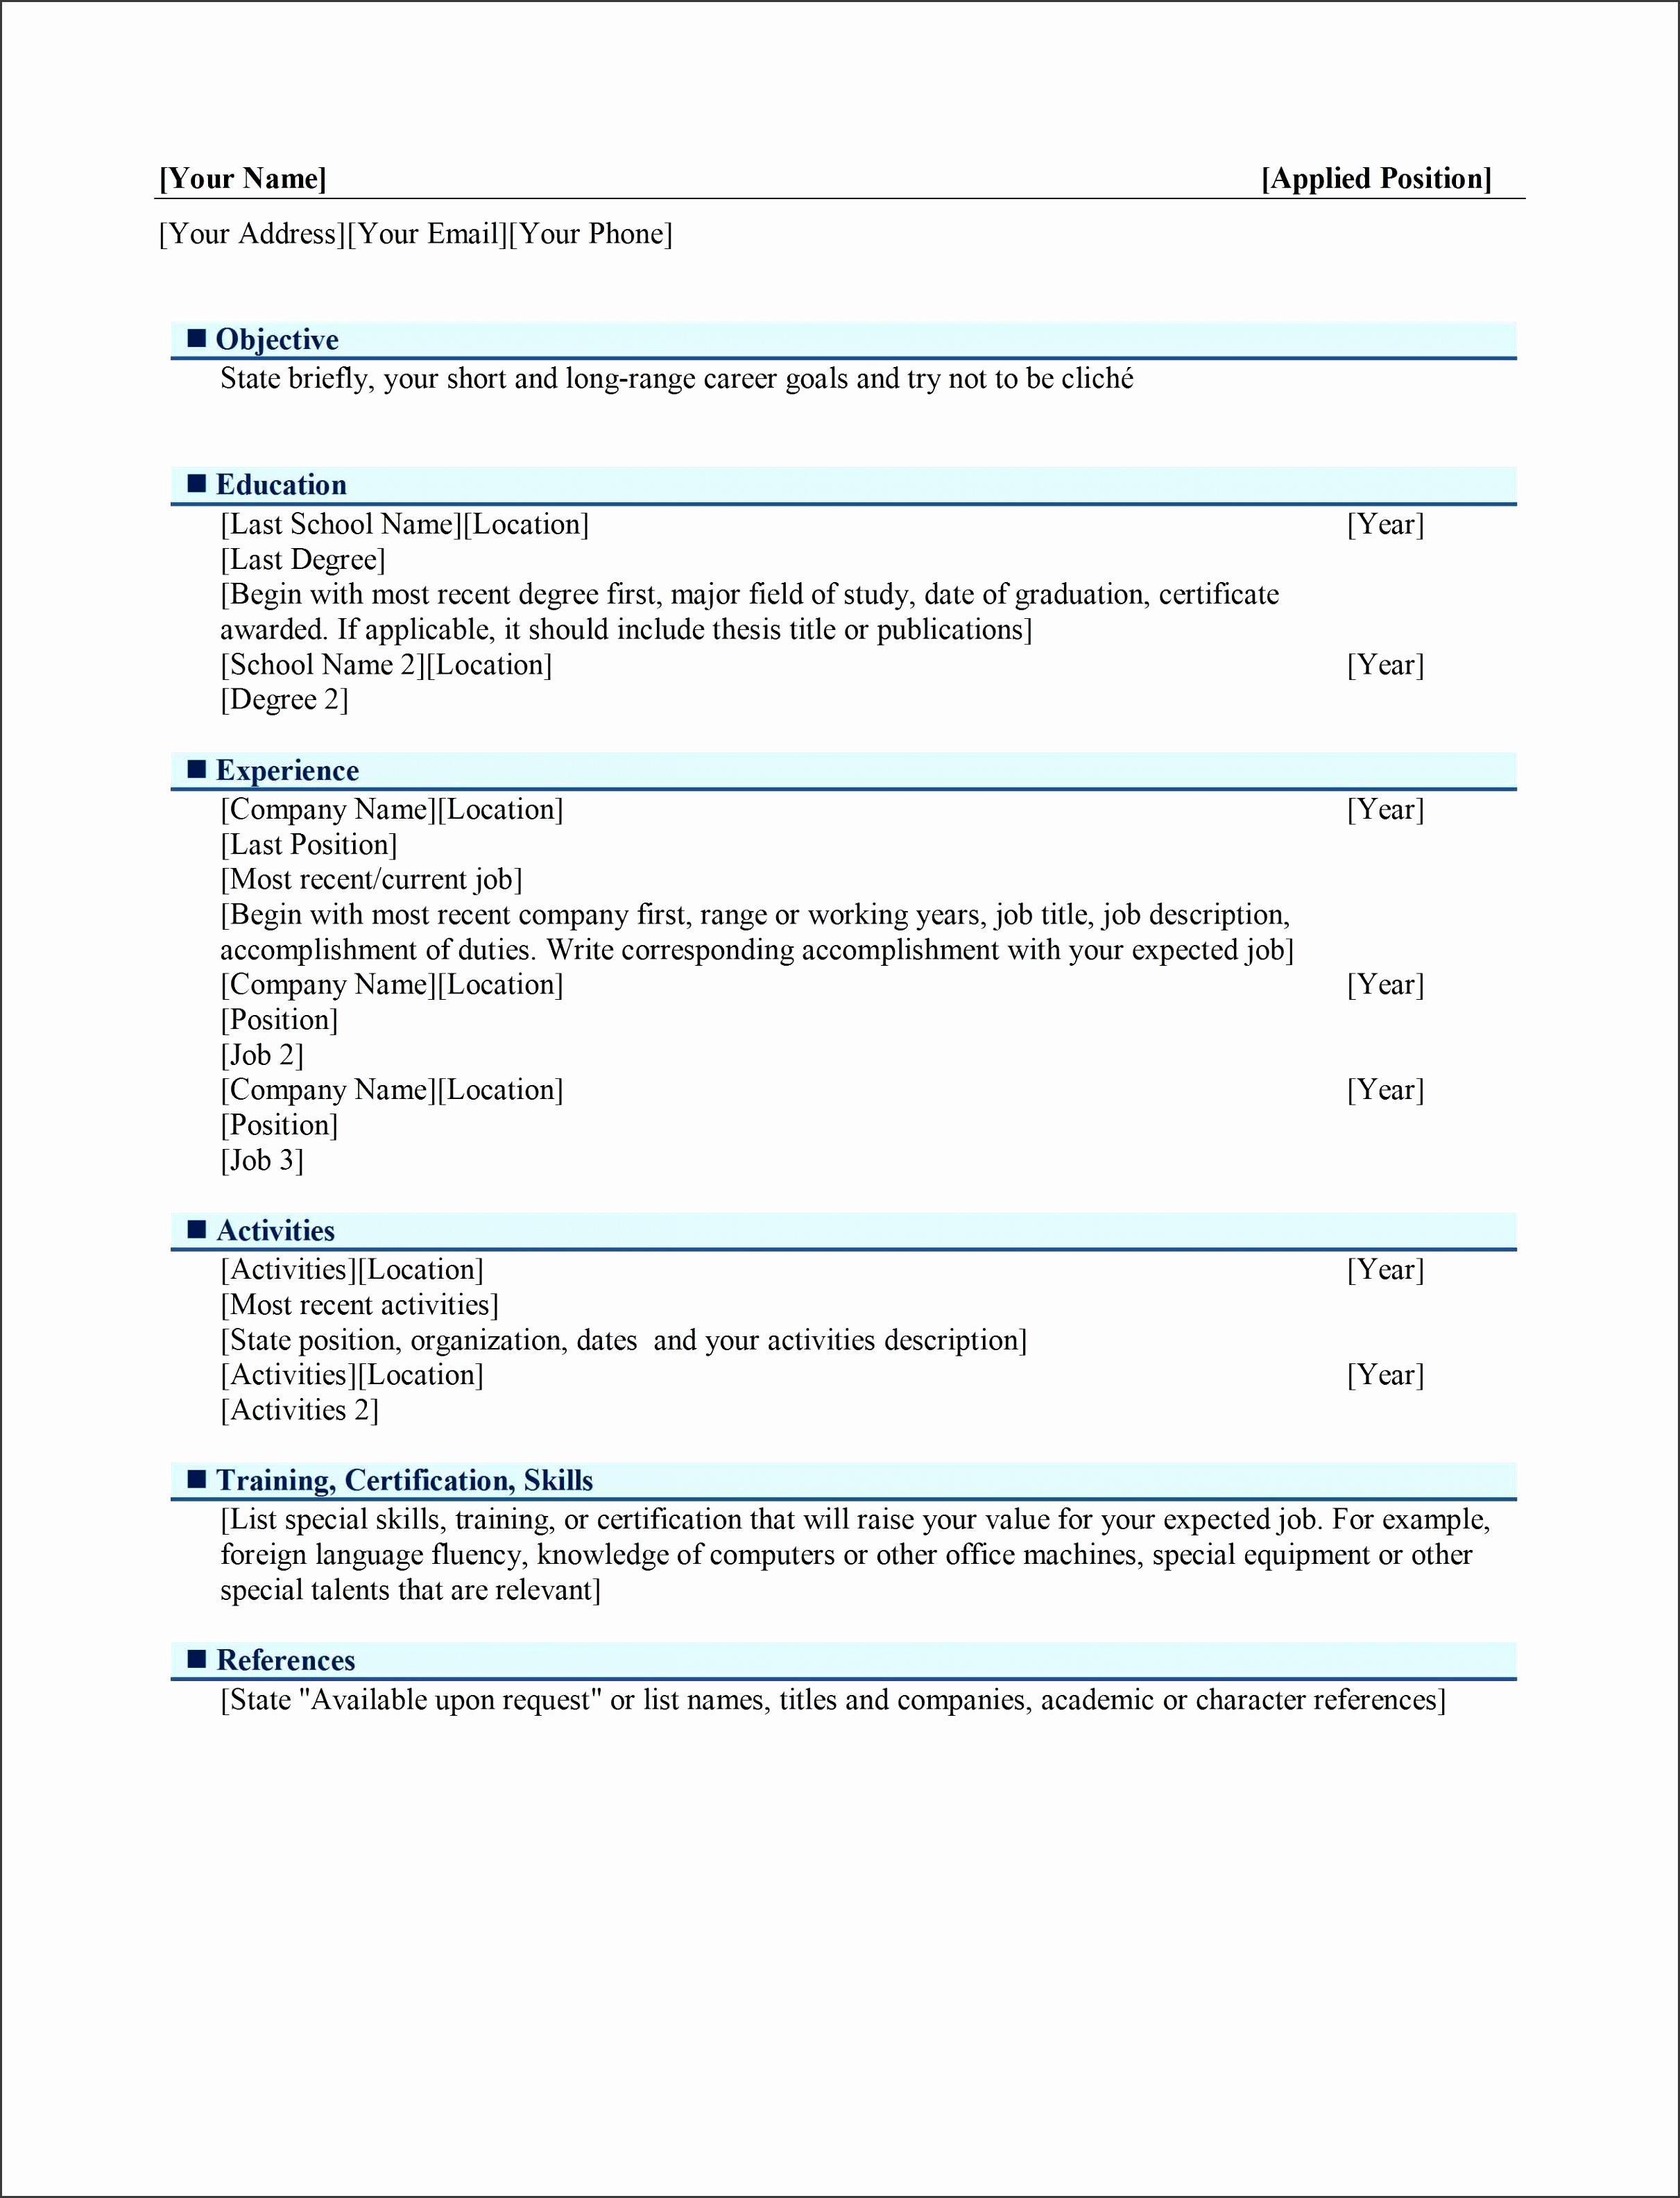 Resume Templates Open fice